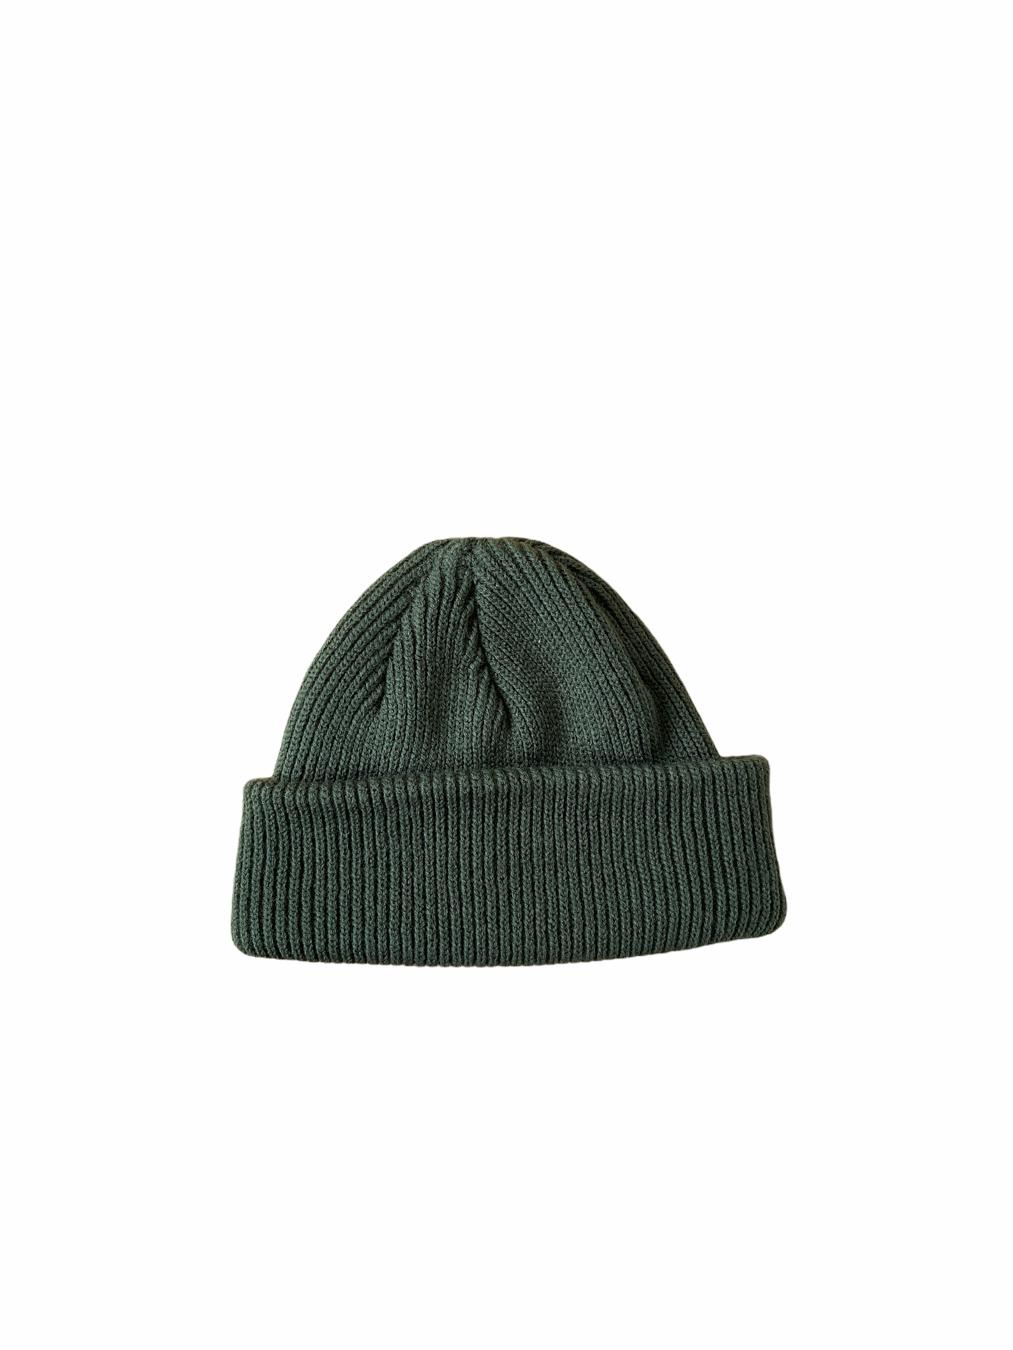 Watch Cap (Dark Green)